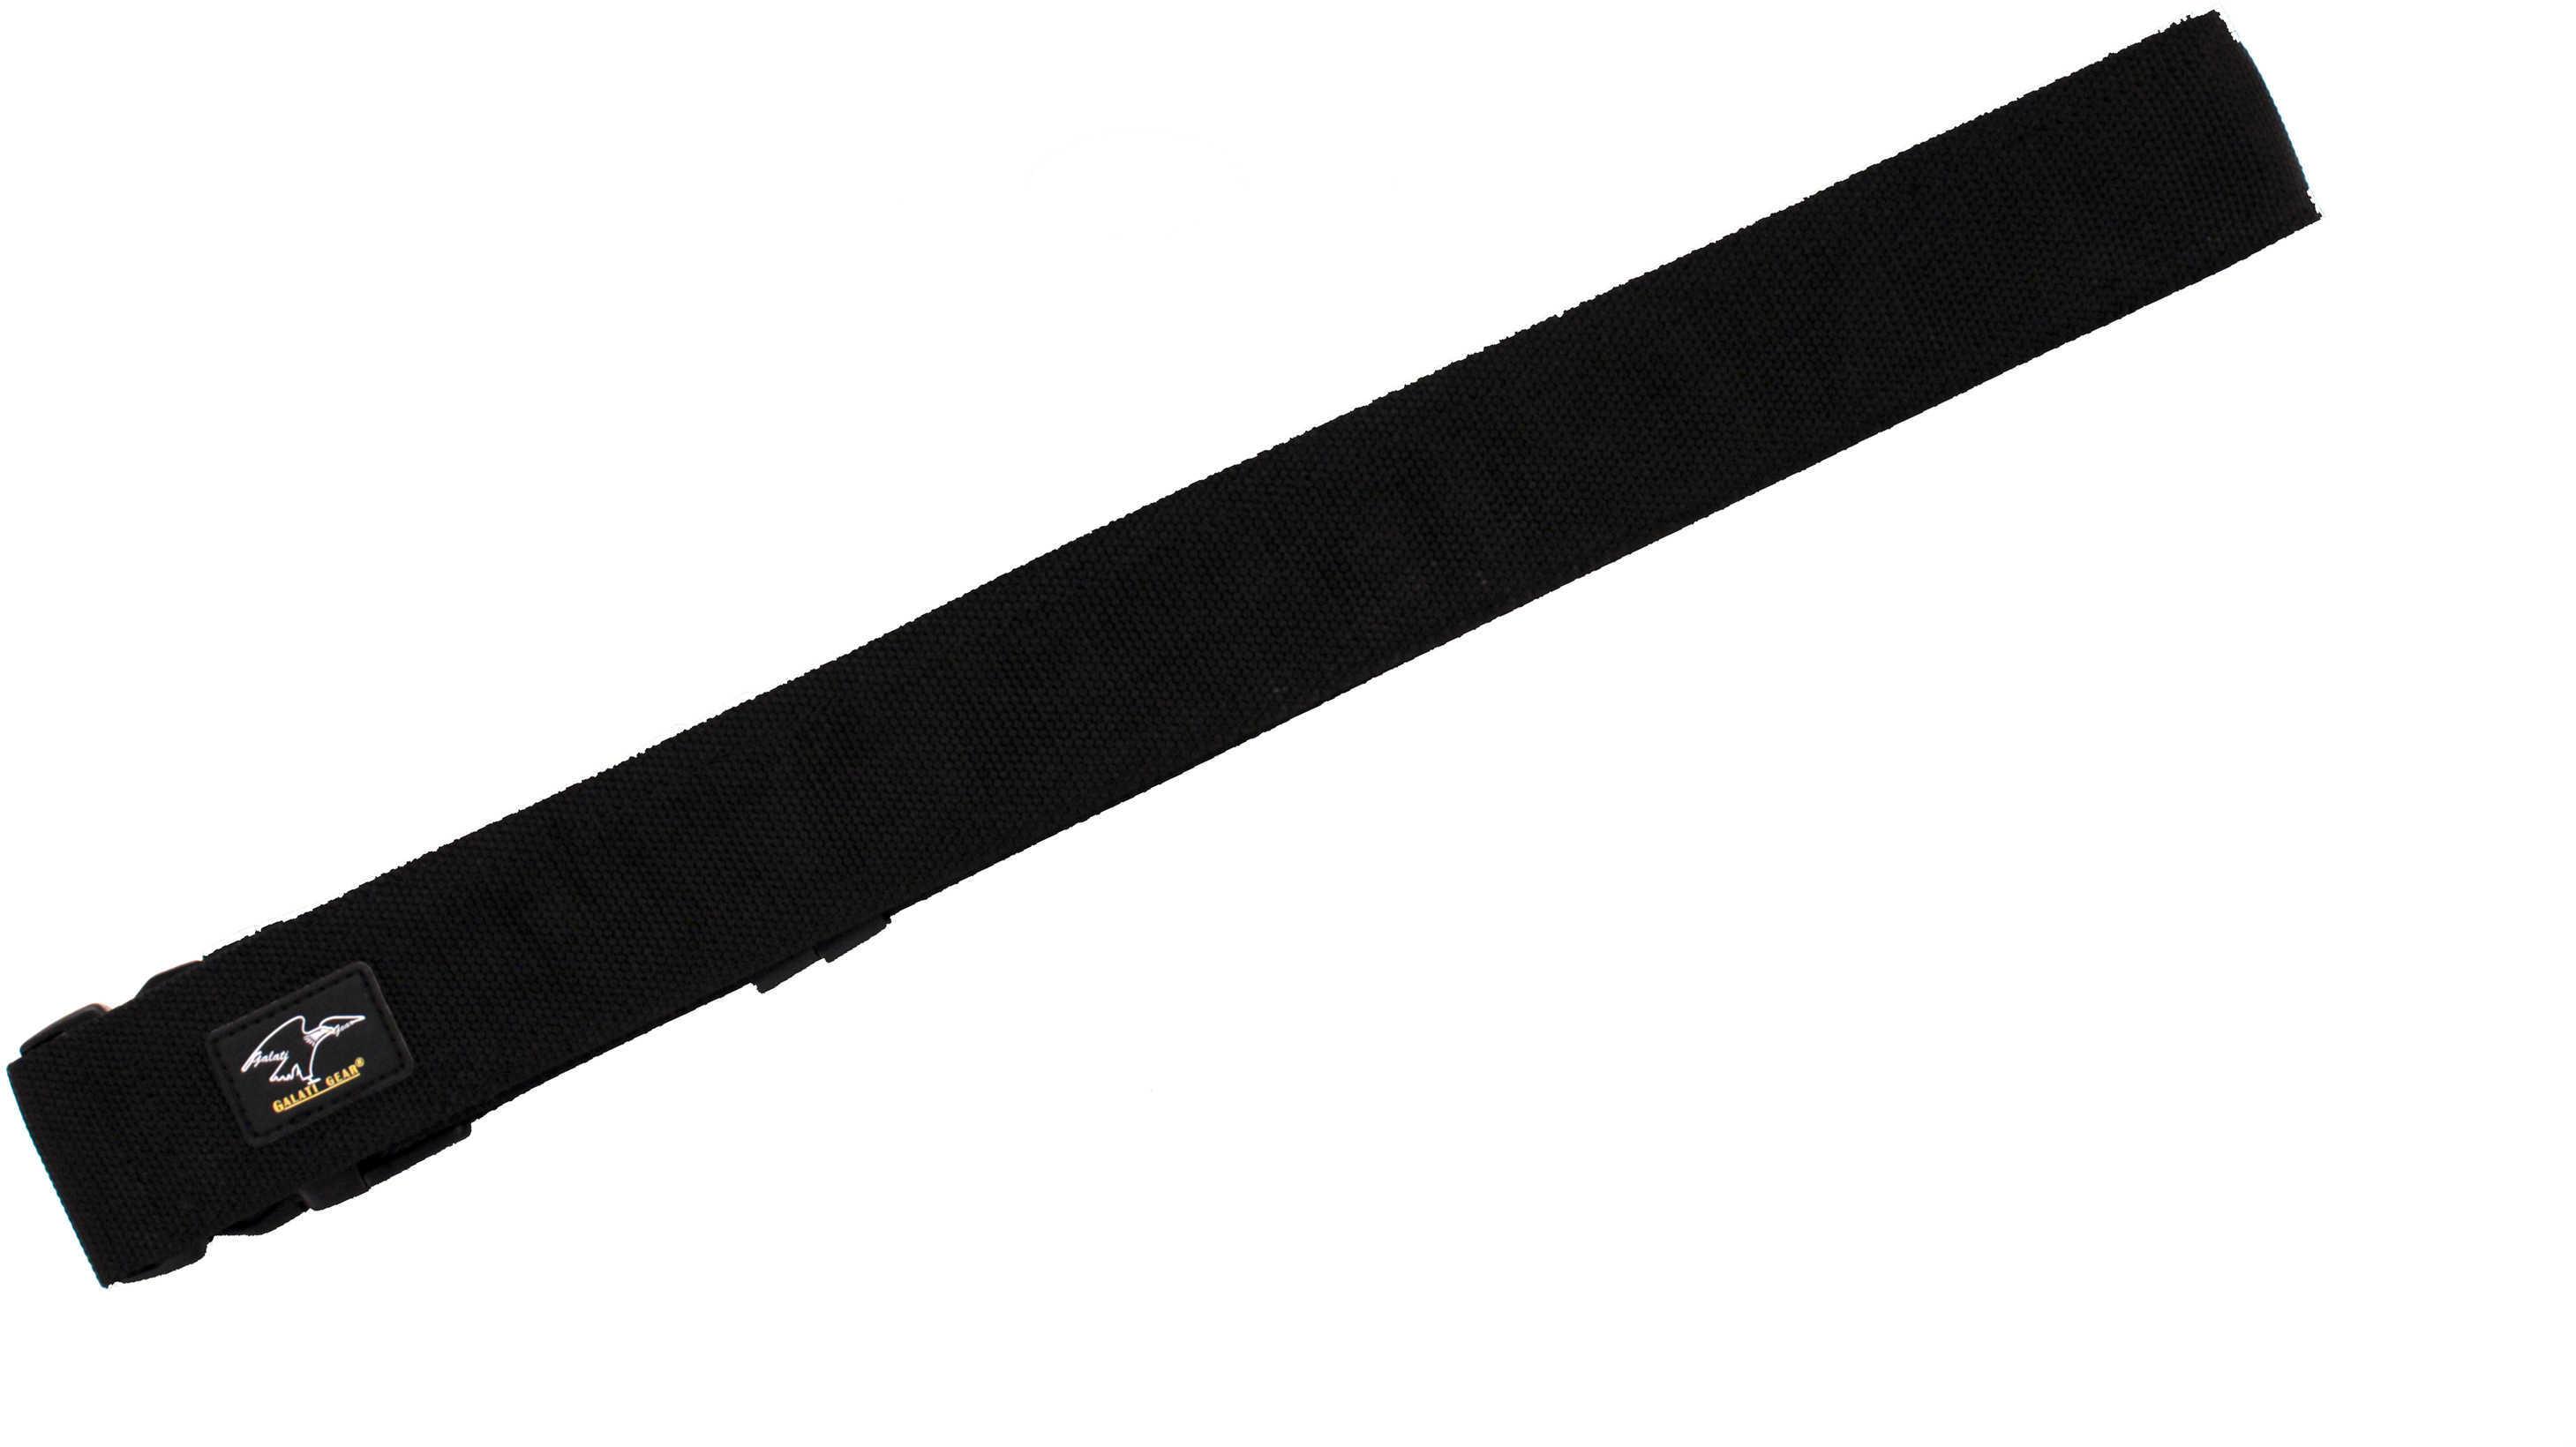 "Belt Duty With Velcro, 55"" Long Md: GLWB55"